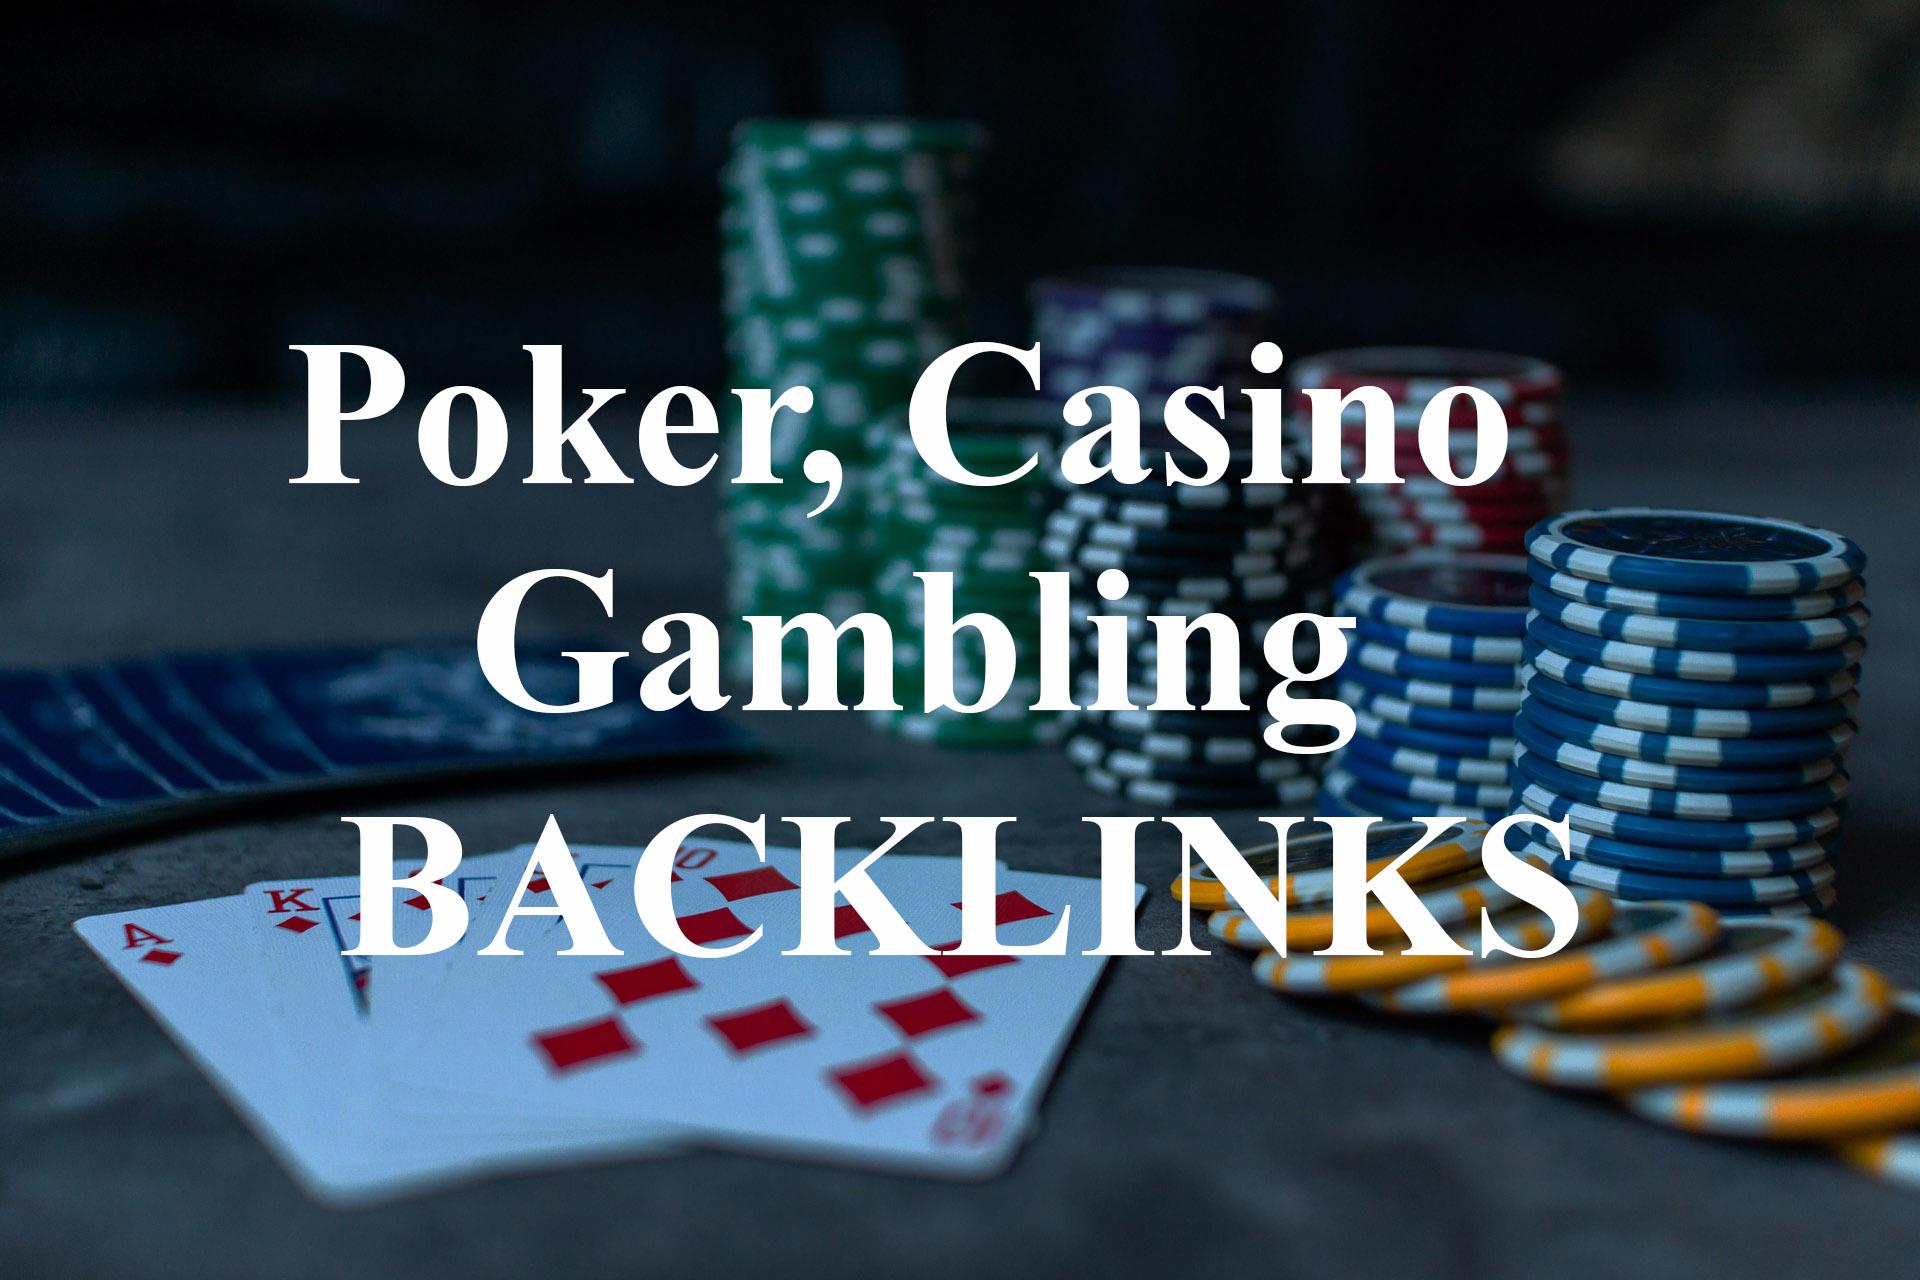 2500 poker,  casino and gambling pbn backlinks